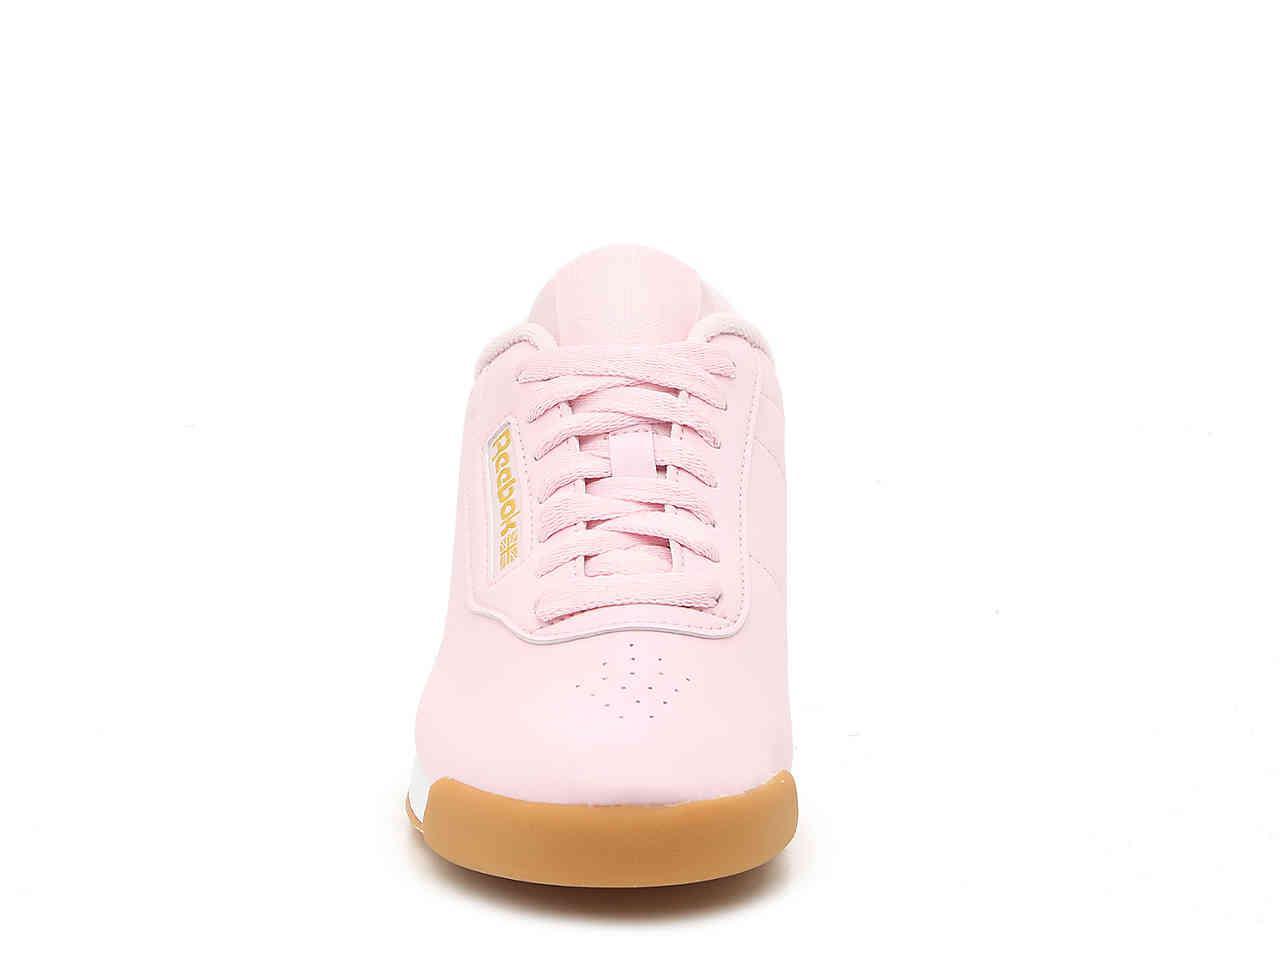 Reebok Rubber Princess Sneaker in Pink